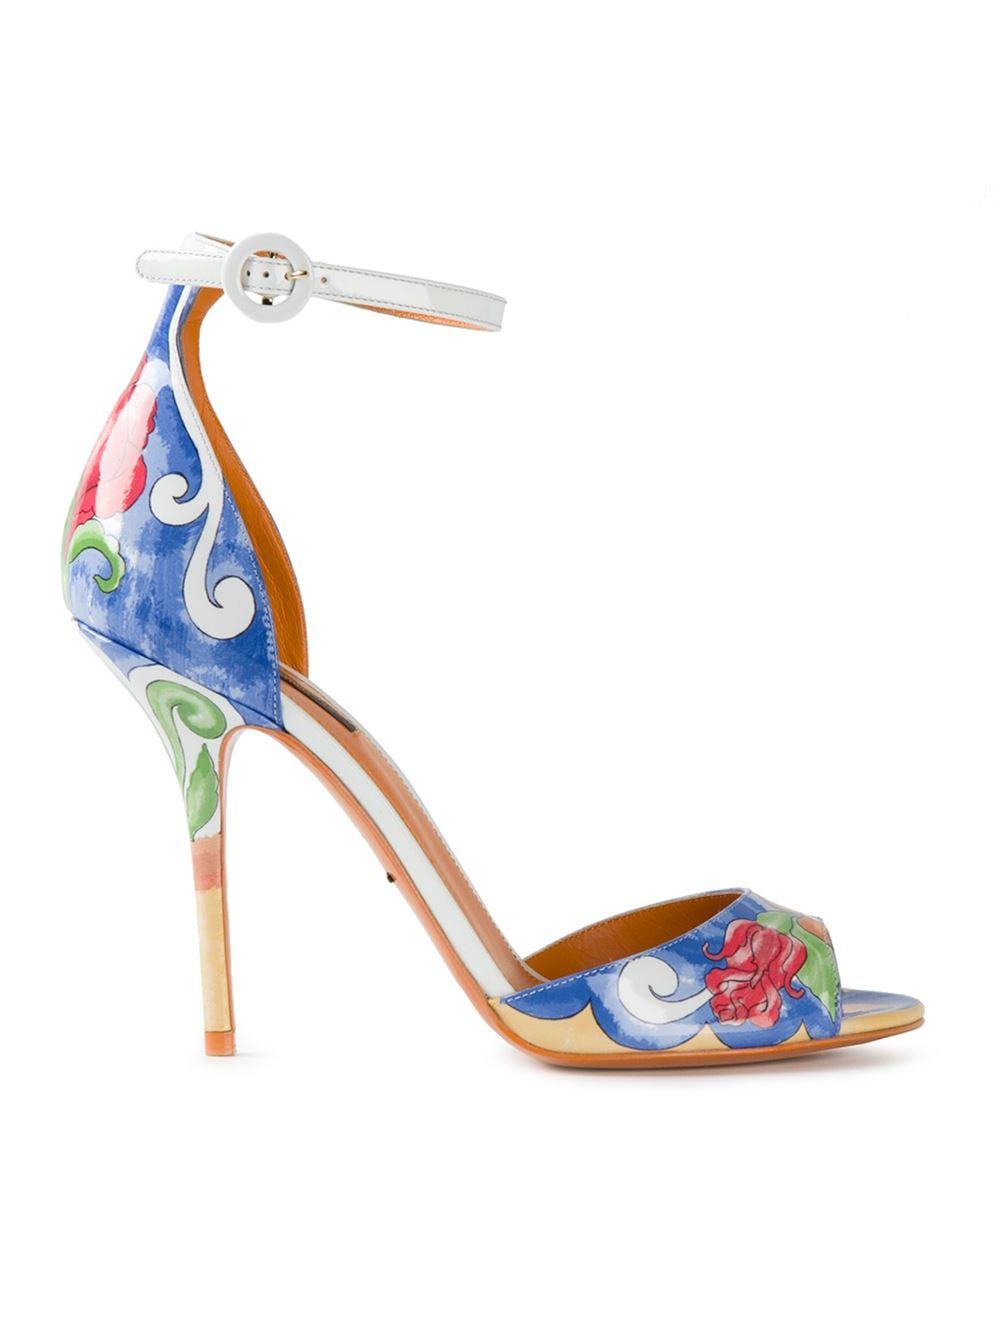 Dolce & Gabbana Keira Leopard Print sandals lBie4e